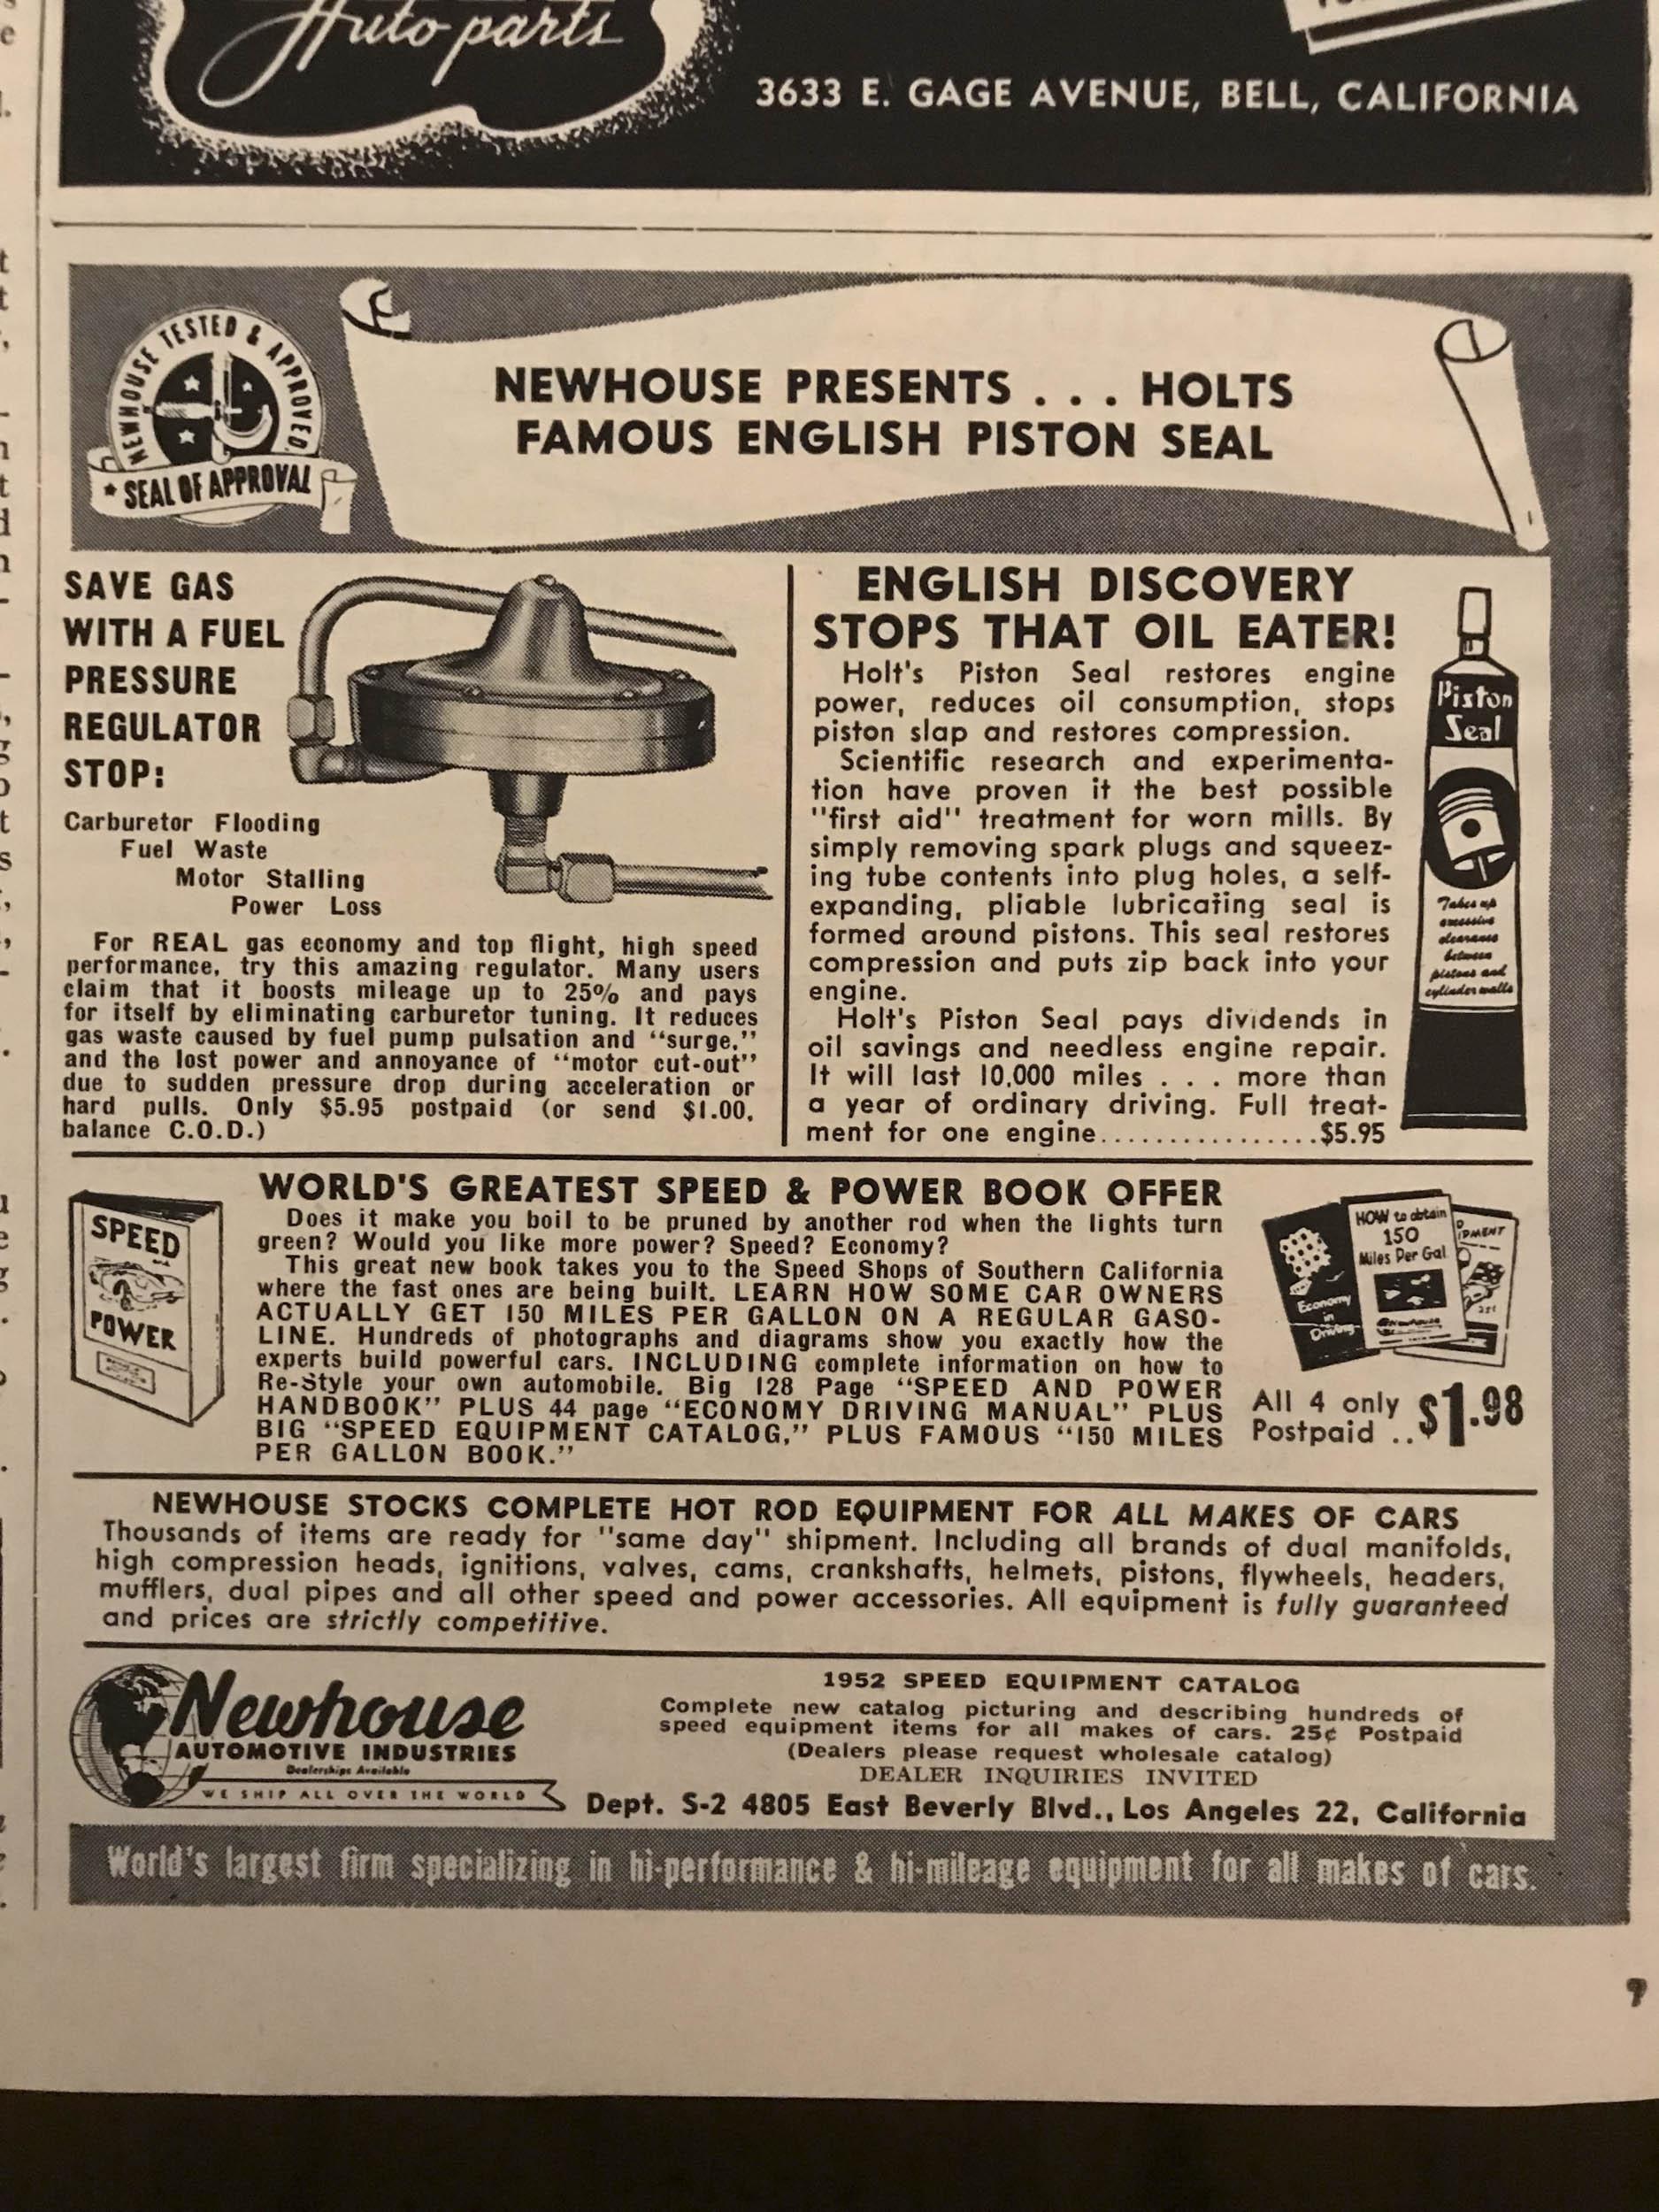 Newhouse Fuel Pressure Regulator Stop (1952)